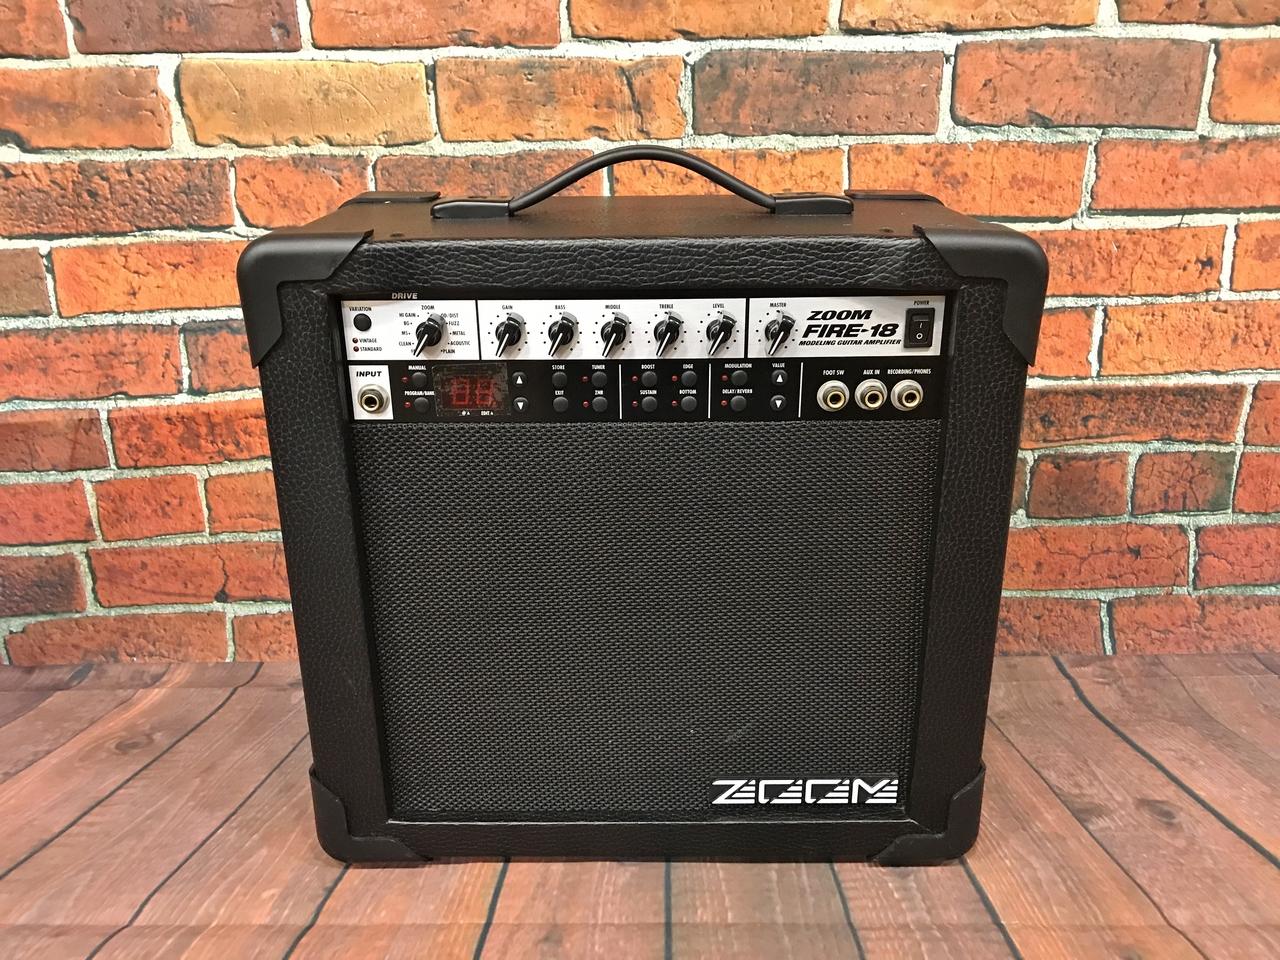 ZOOM消防-18模拟组合吉他音箱[使用美容产品]